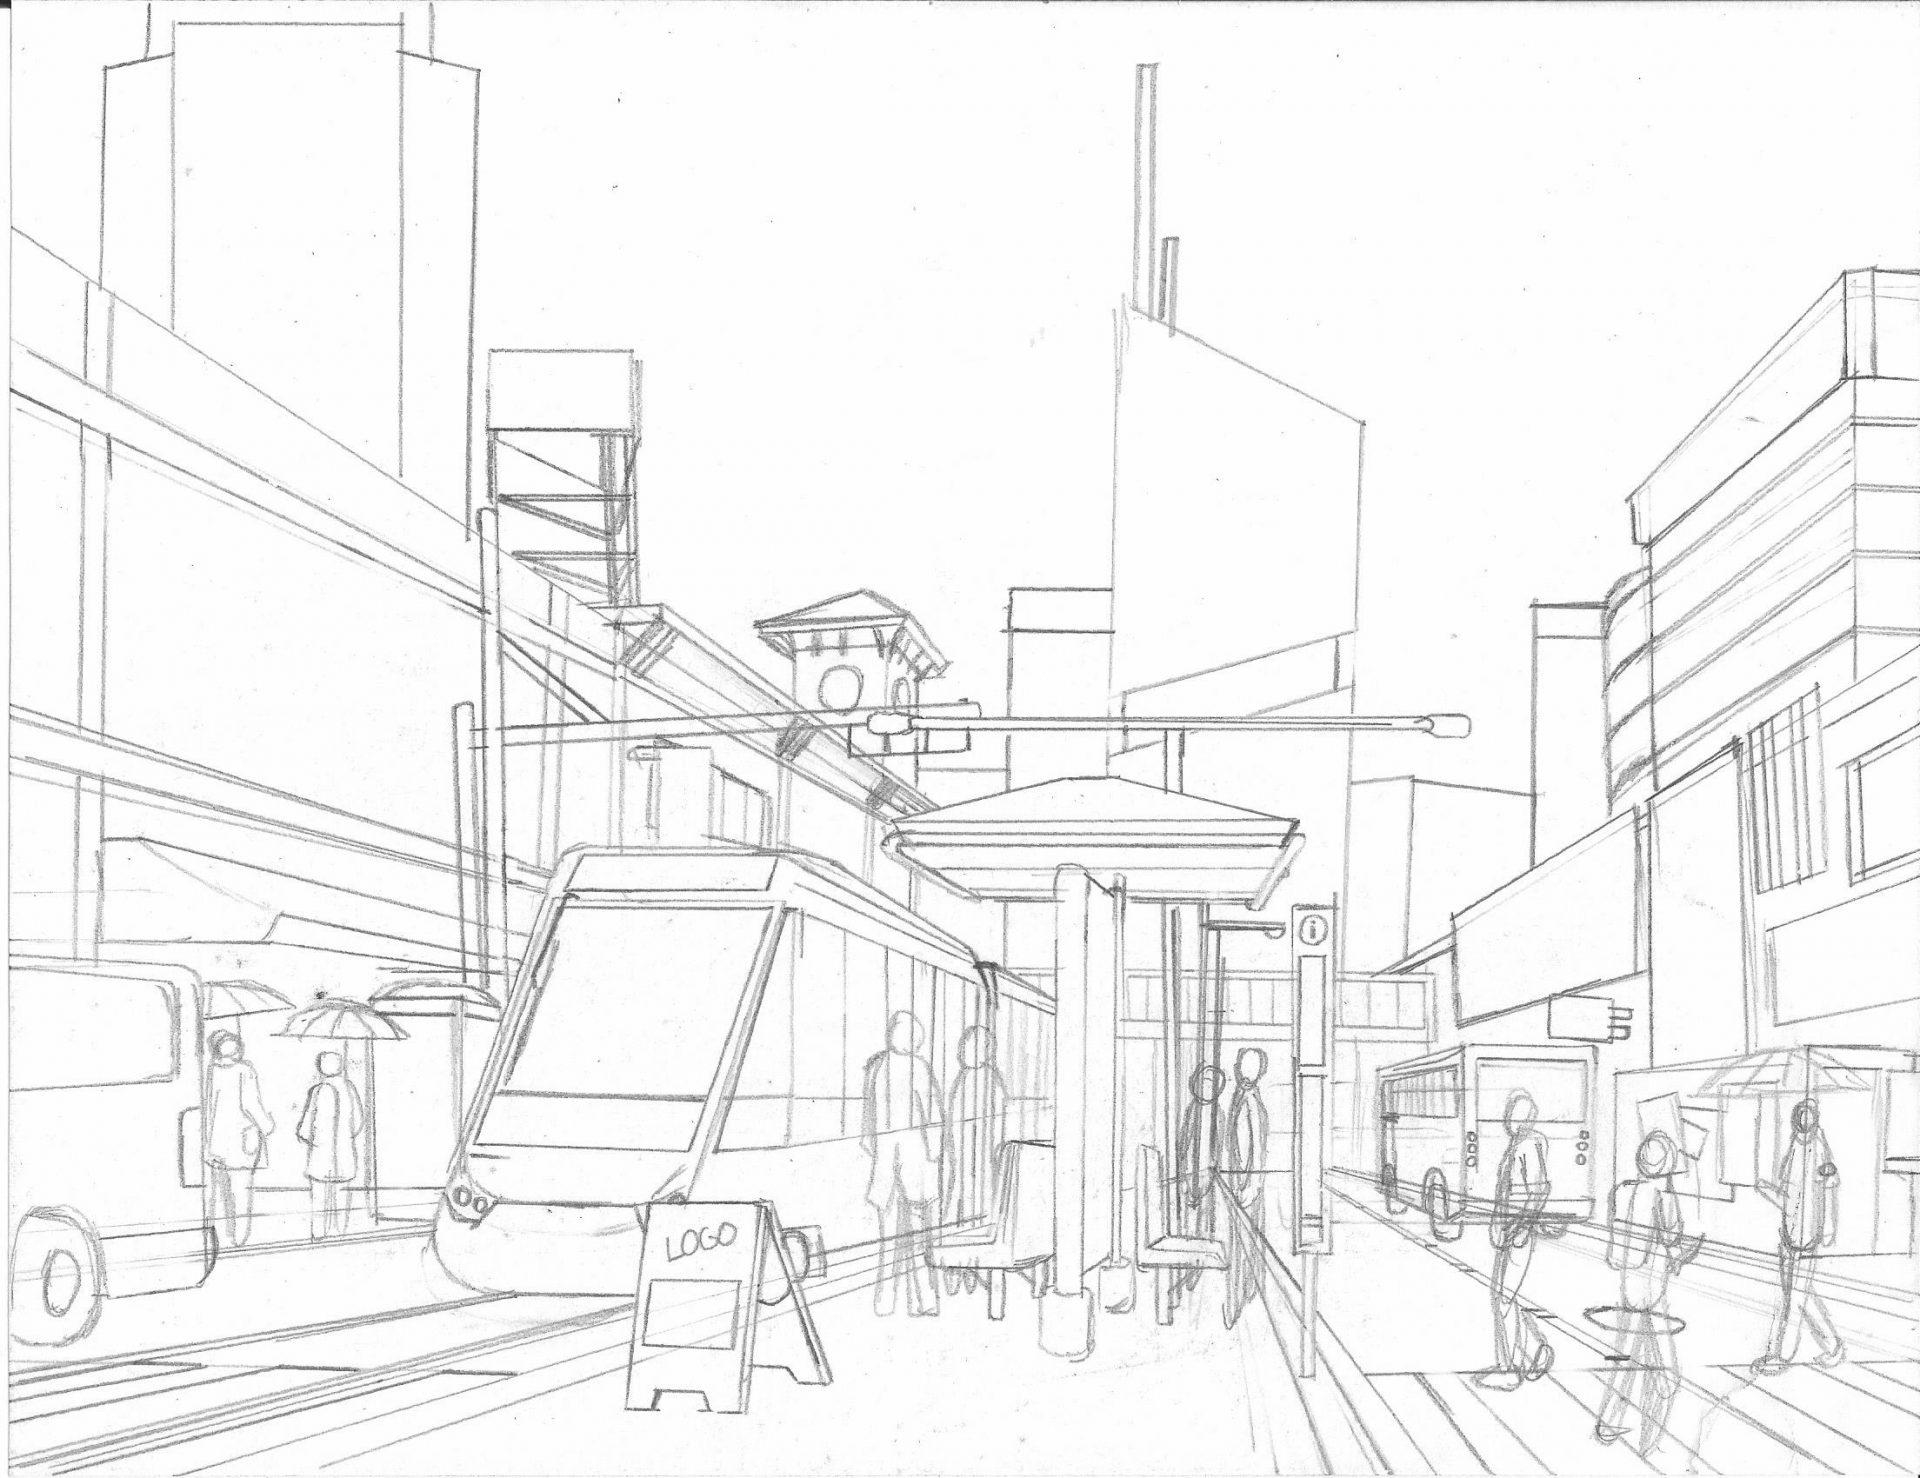 City Final Project